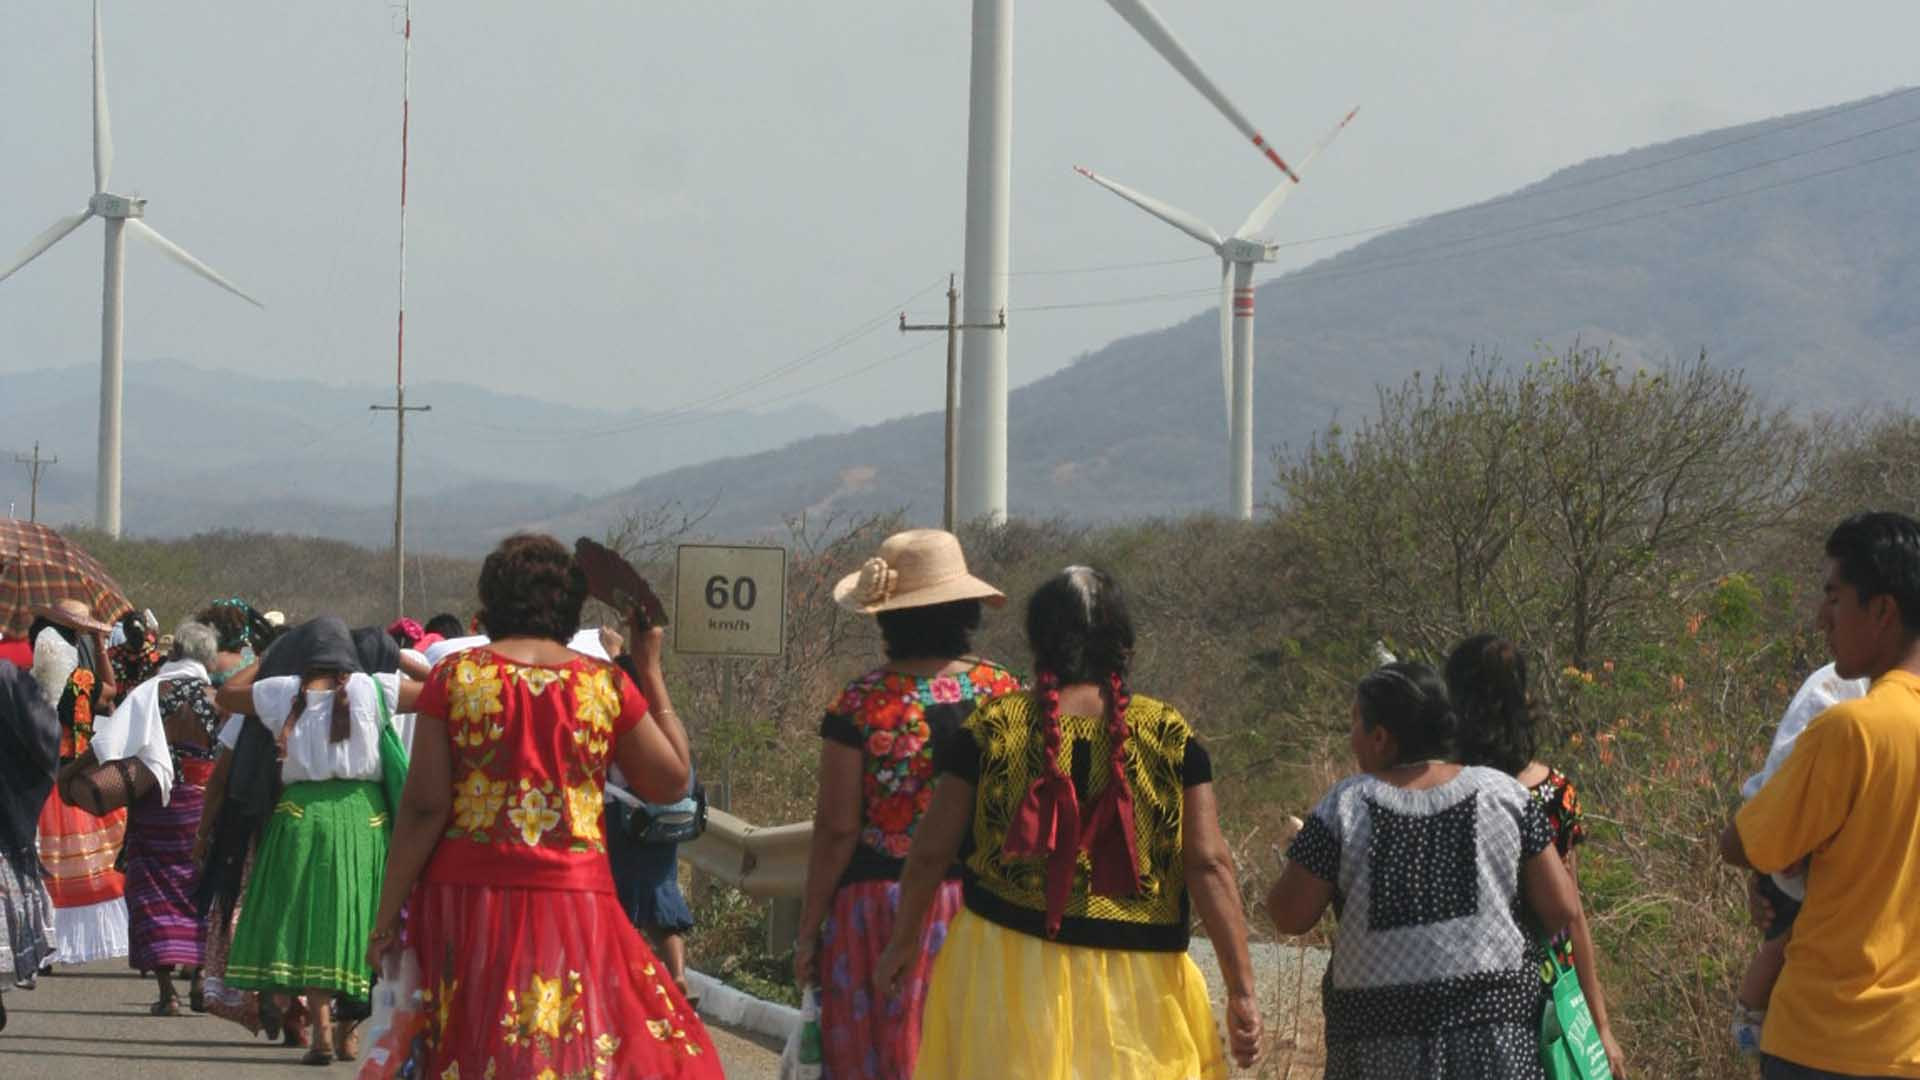 Inversión en energías renovables en México